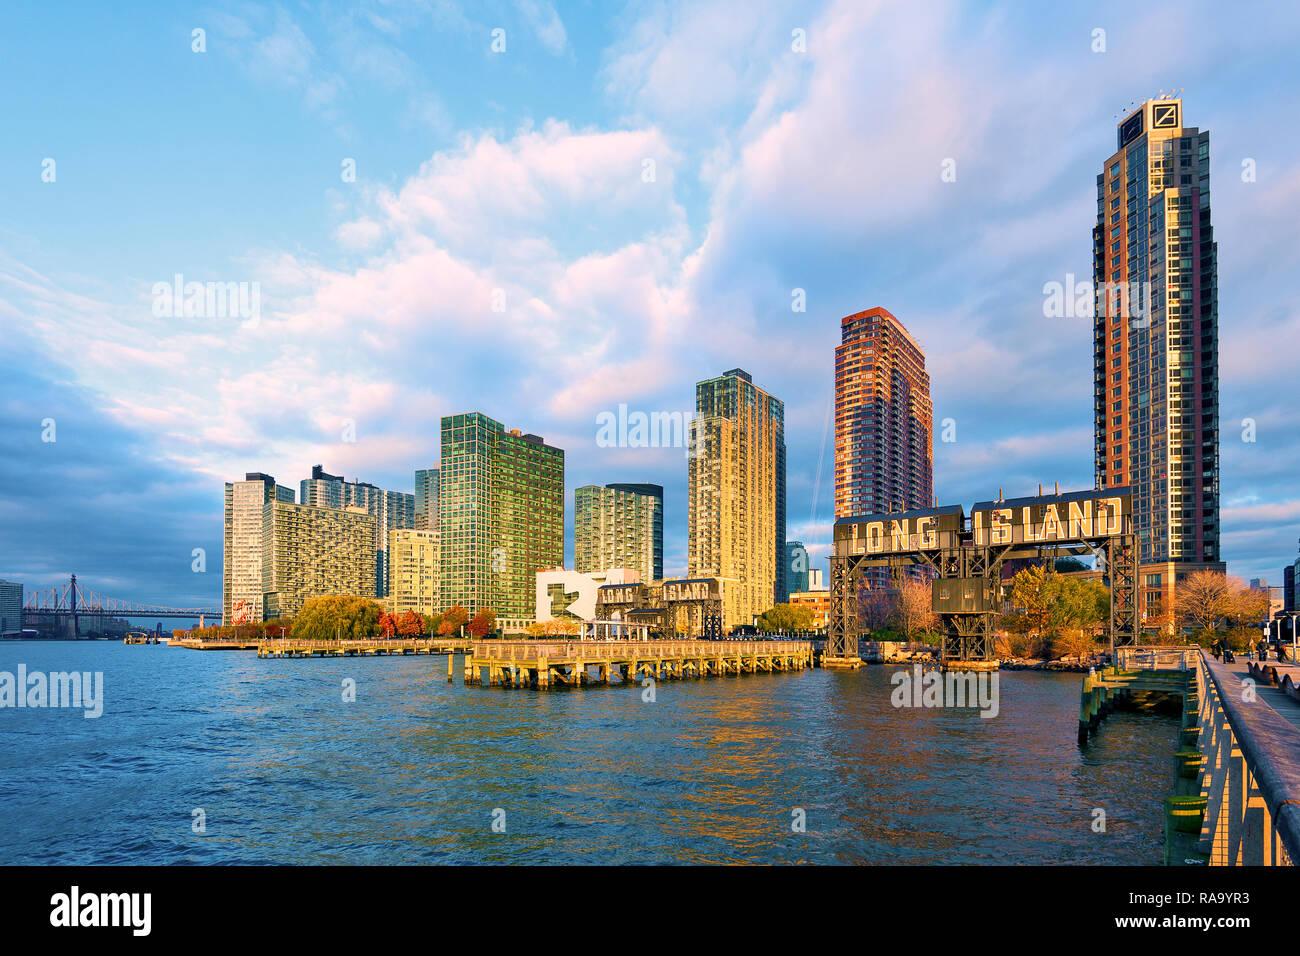 Long Island City, Queens, New York, New York City Stock Photo